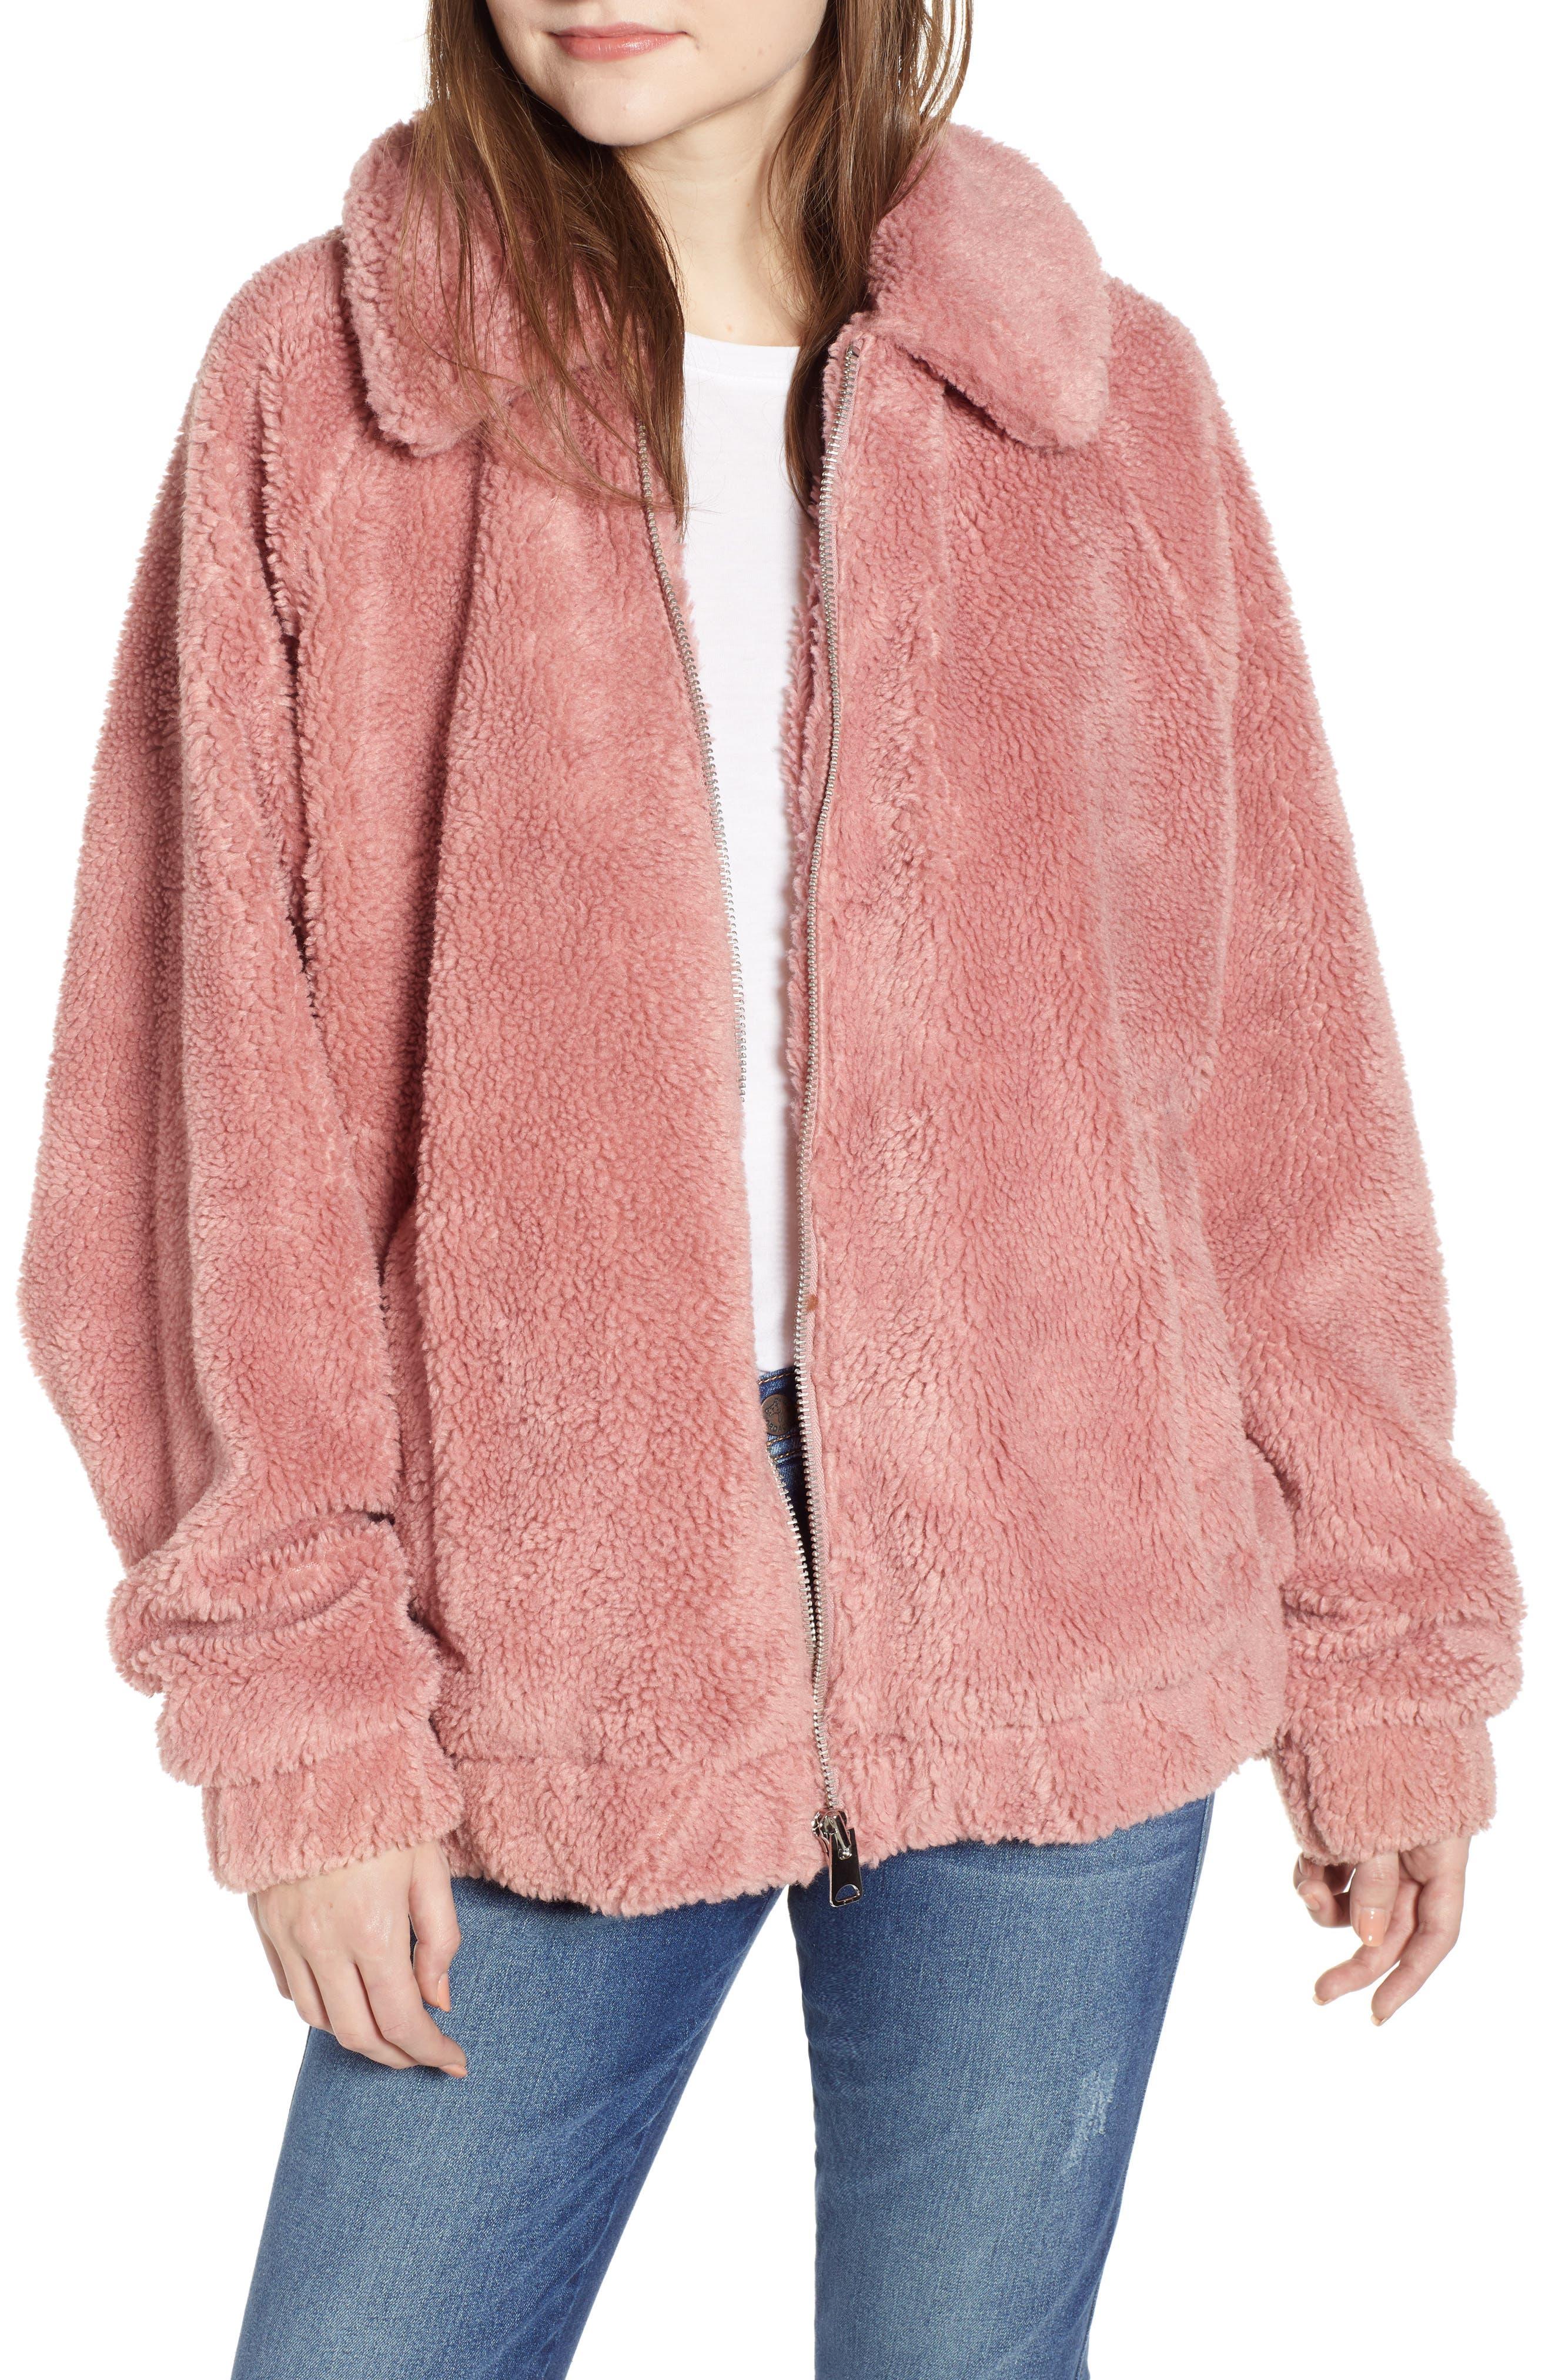 Bdg Urban Outfitters Batwing Teddy Fleece Jacket, Pink